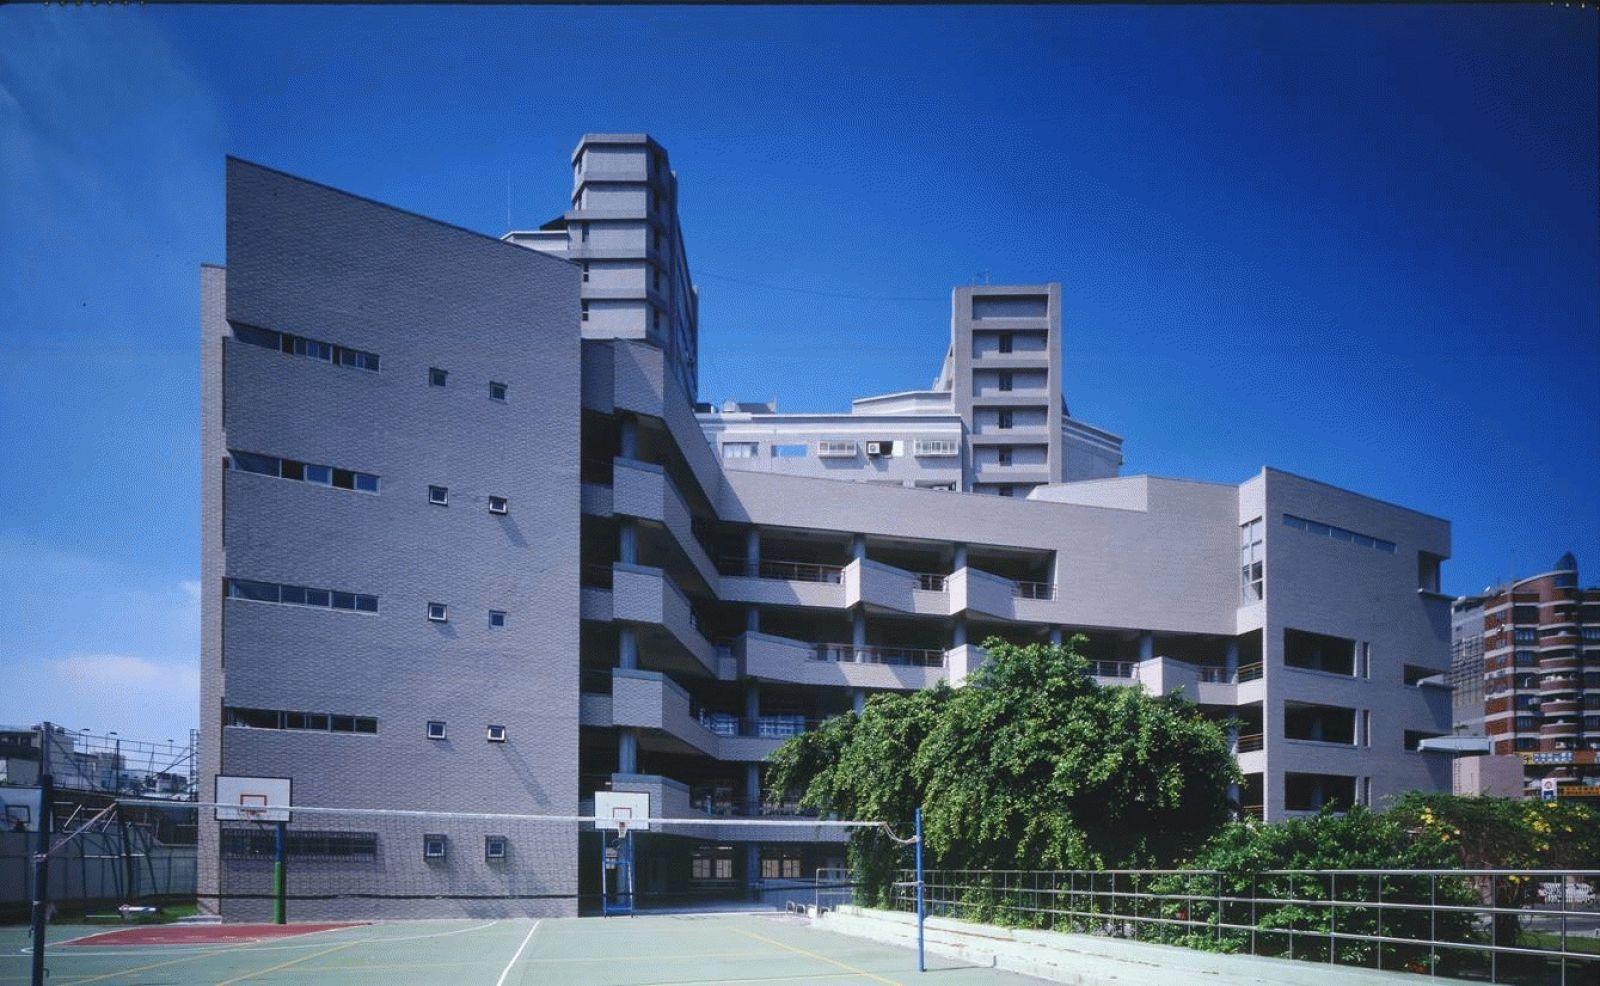 South building of tainan nursing school